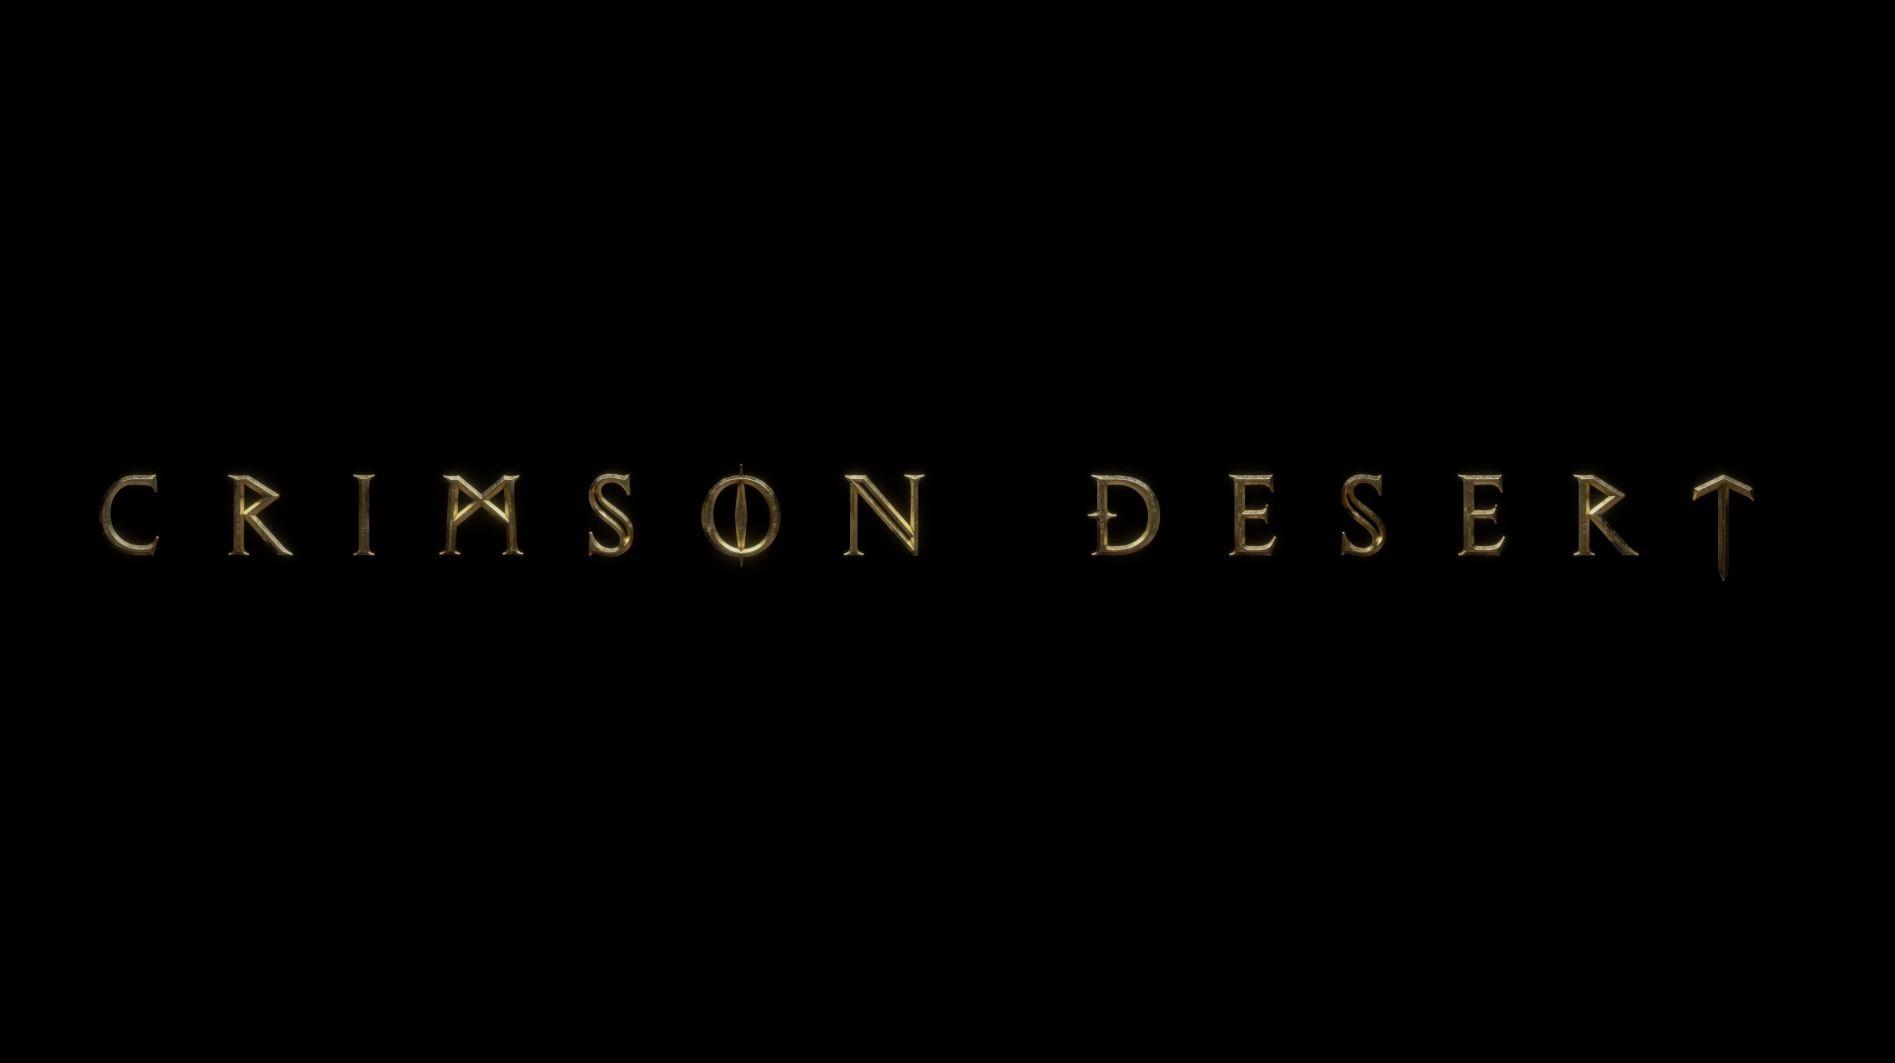 crimson-desert-news-reviews-videos